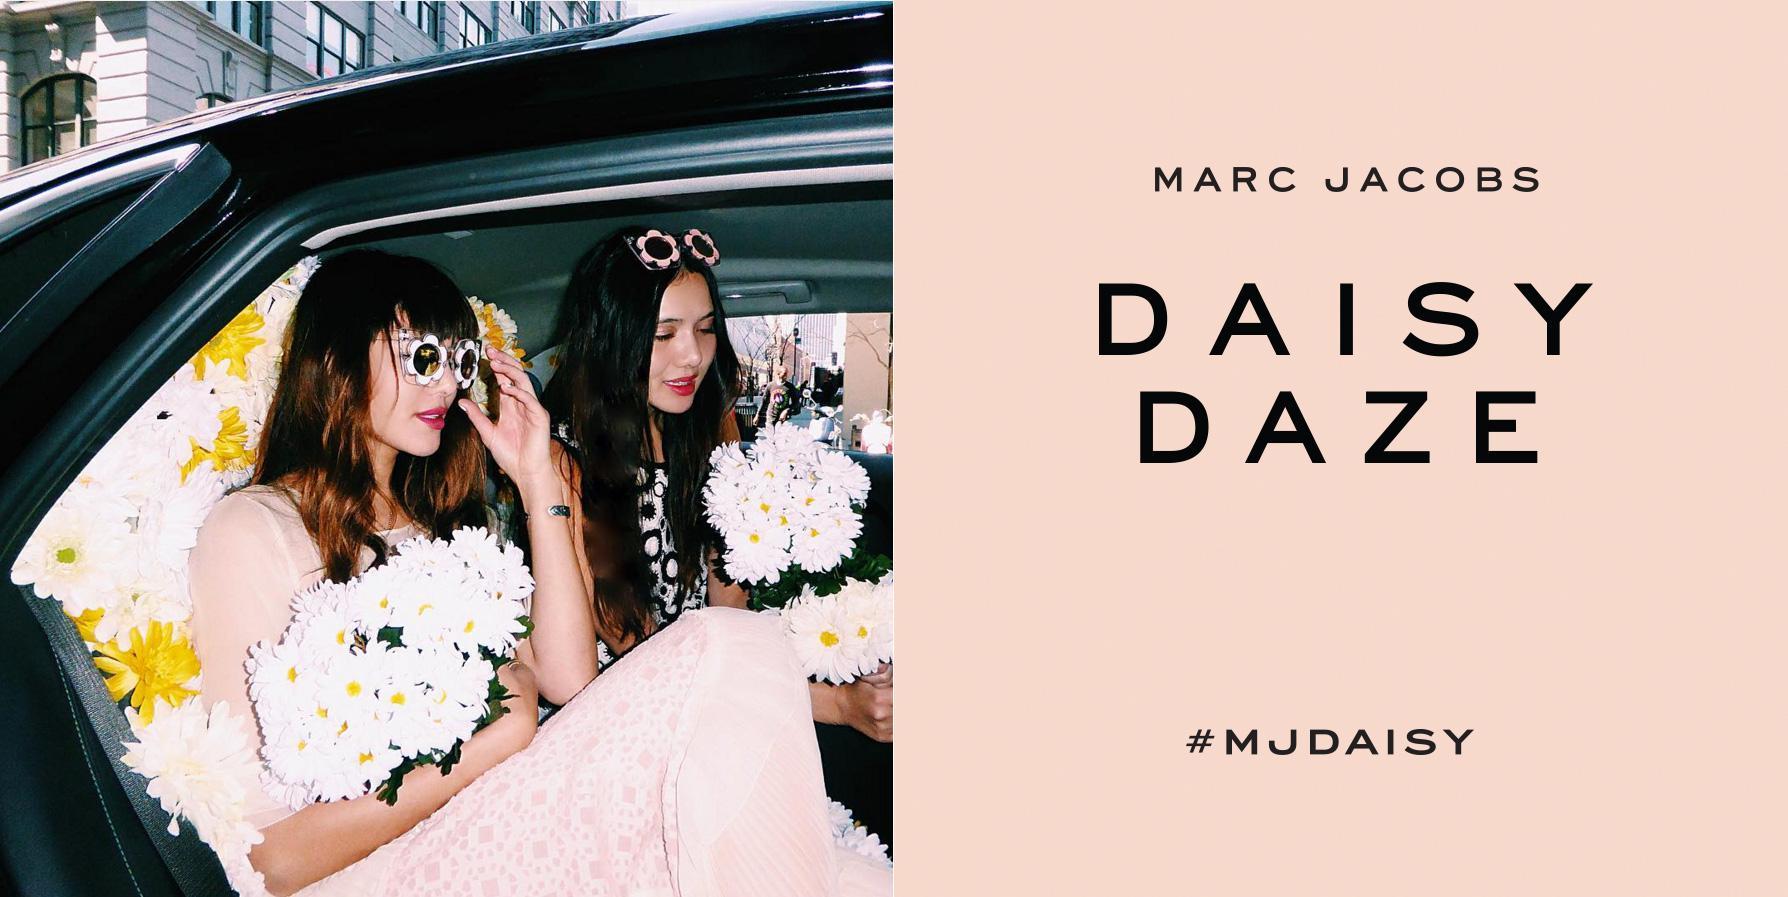 Thumbnail for Marc Jacobs Daisy Daze